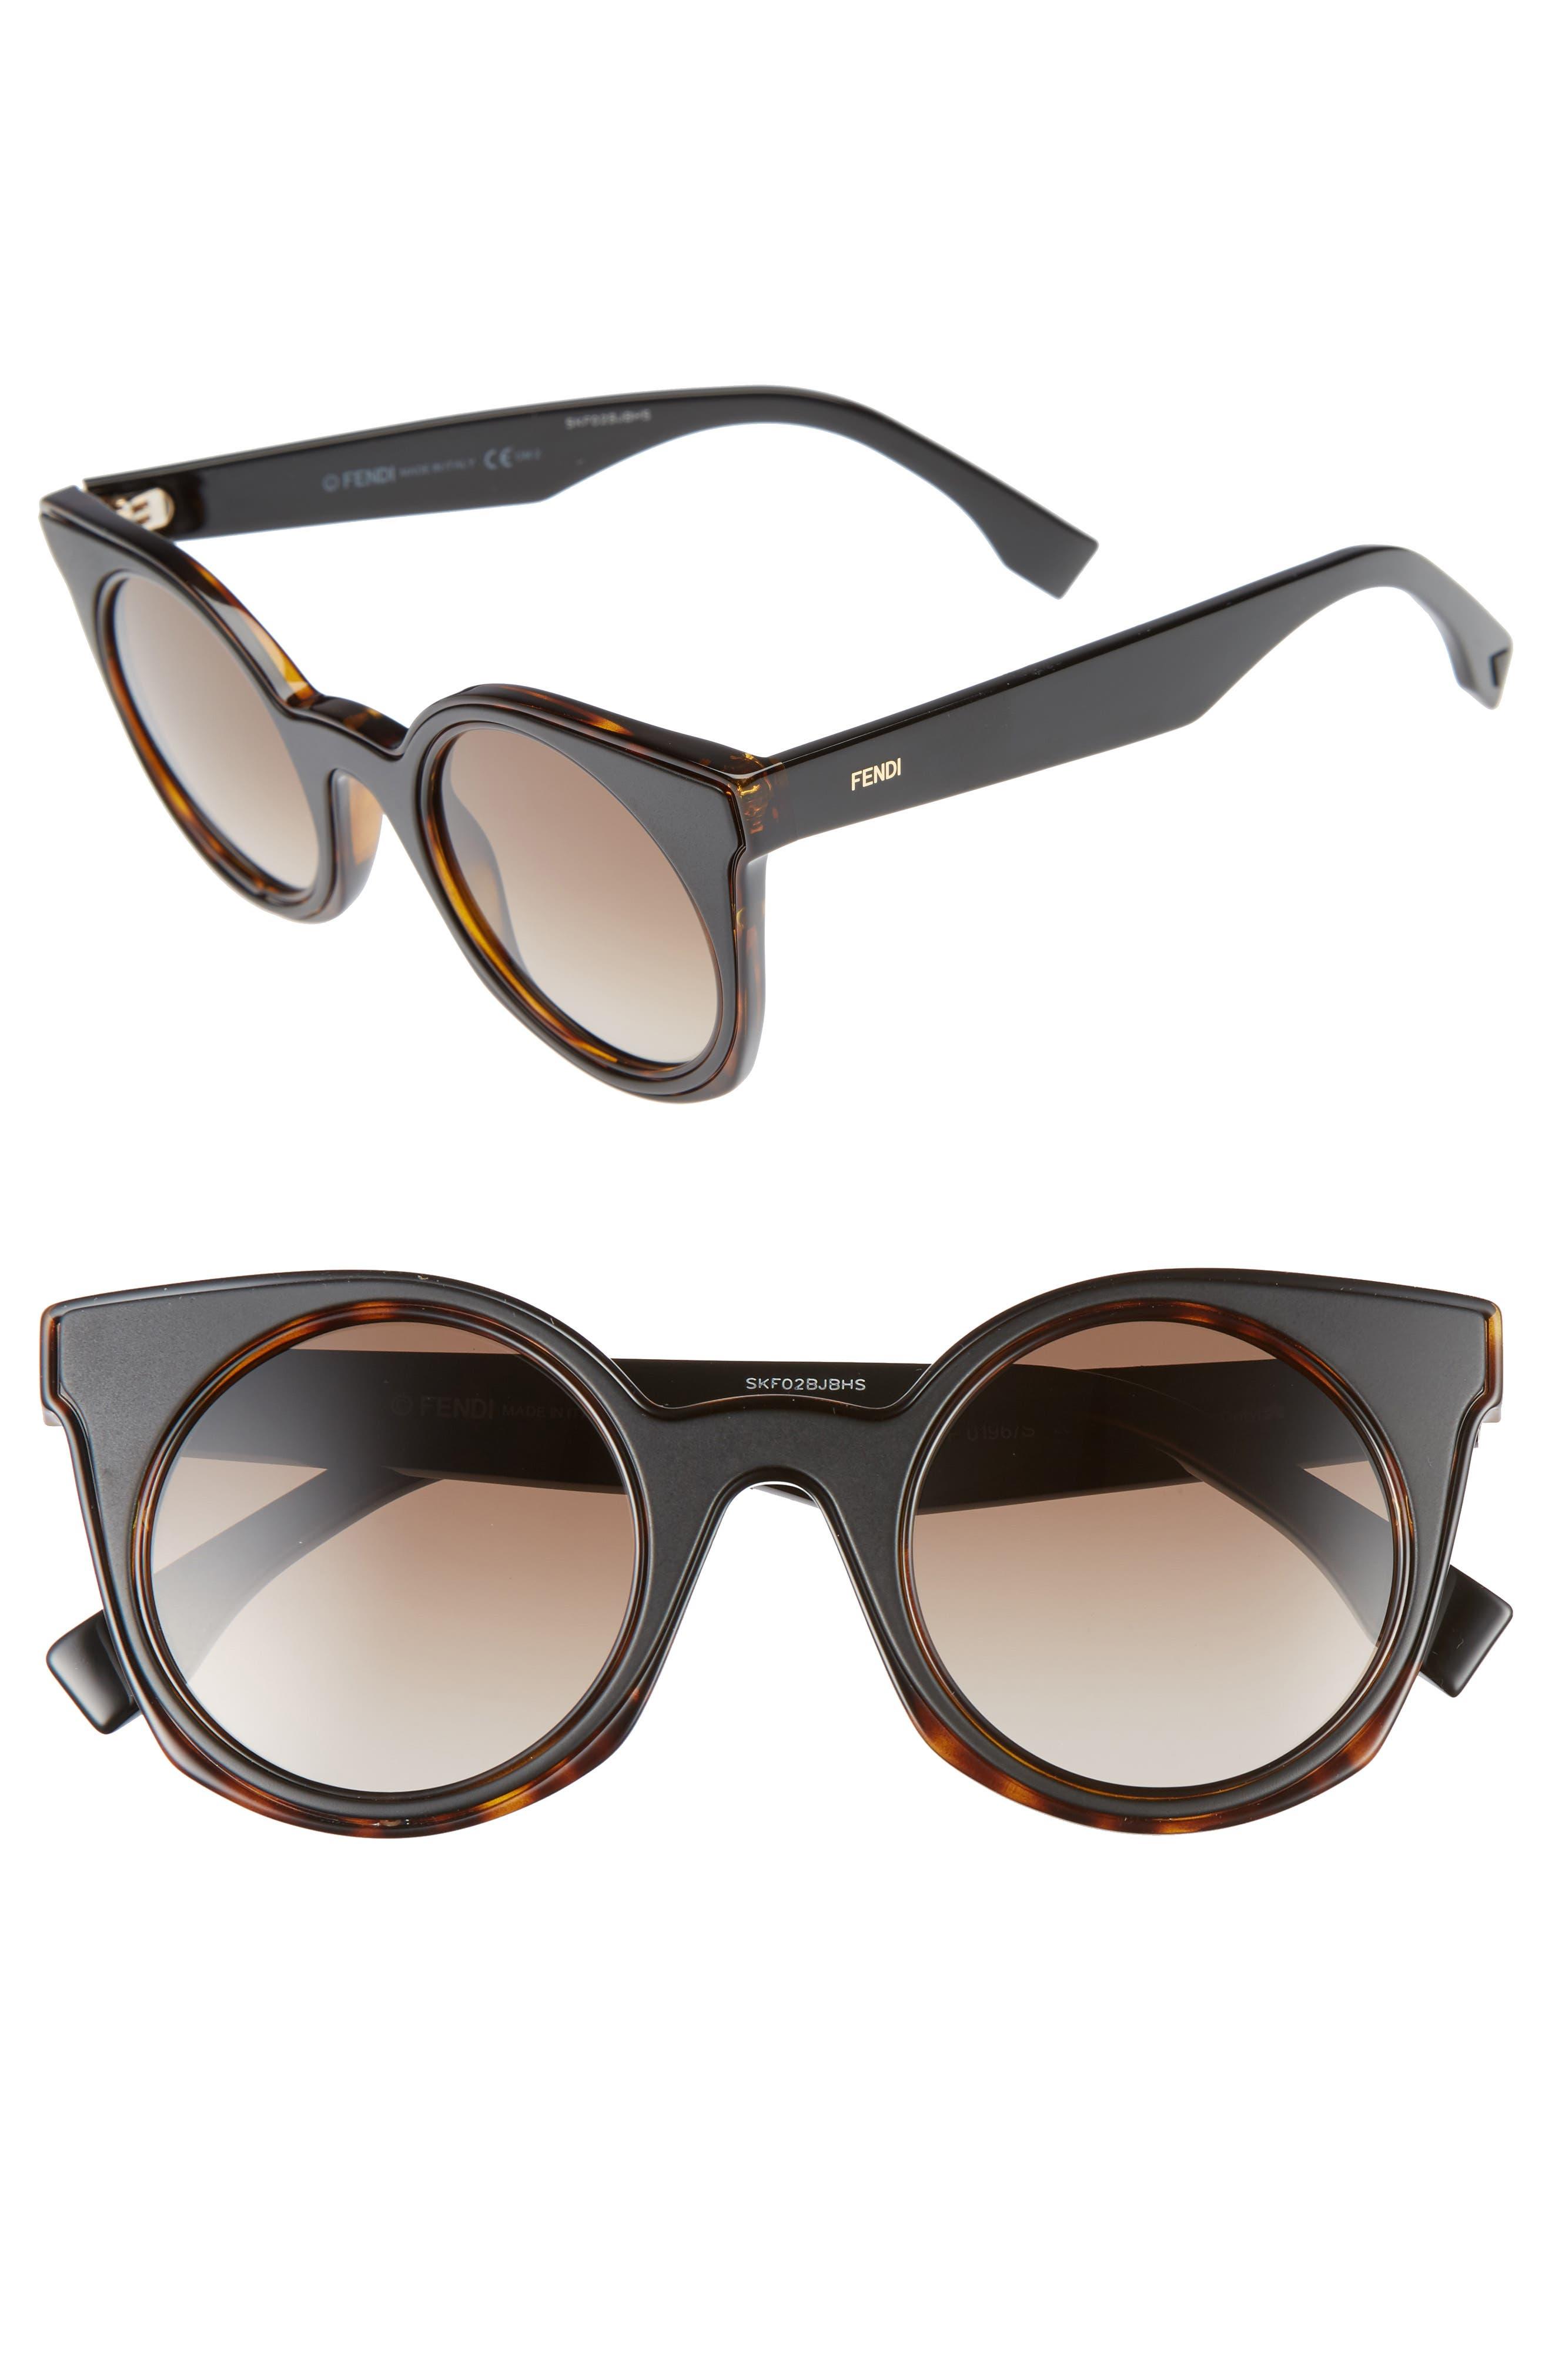 48mm Cat Eye Sunglasses,                             Main thumbnail 1, color,                             210